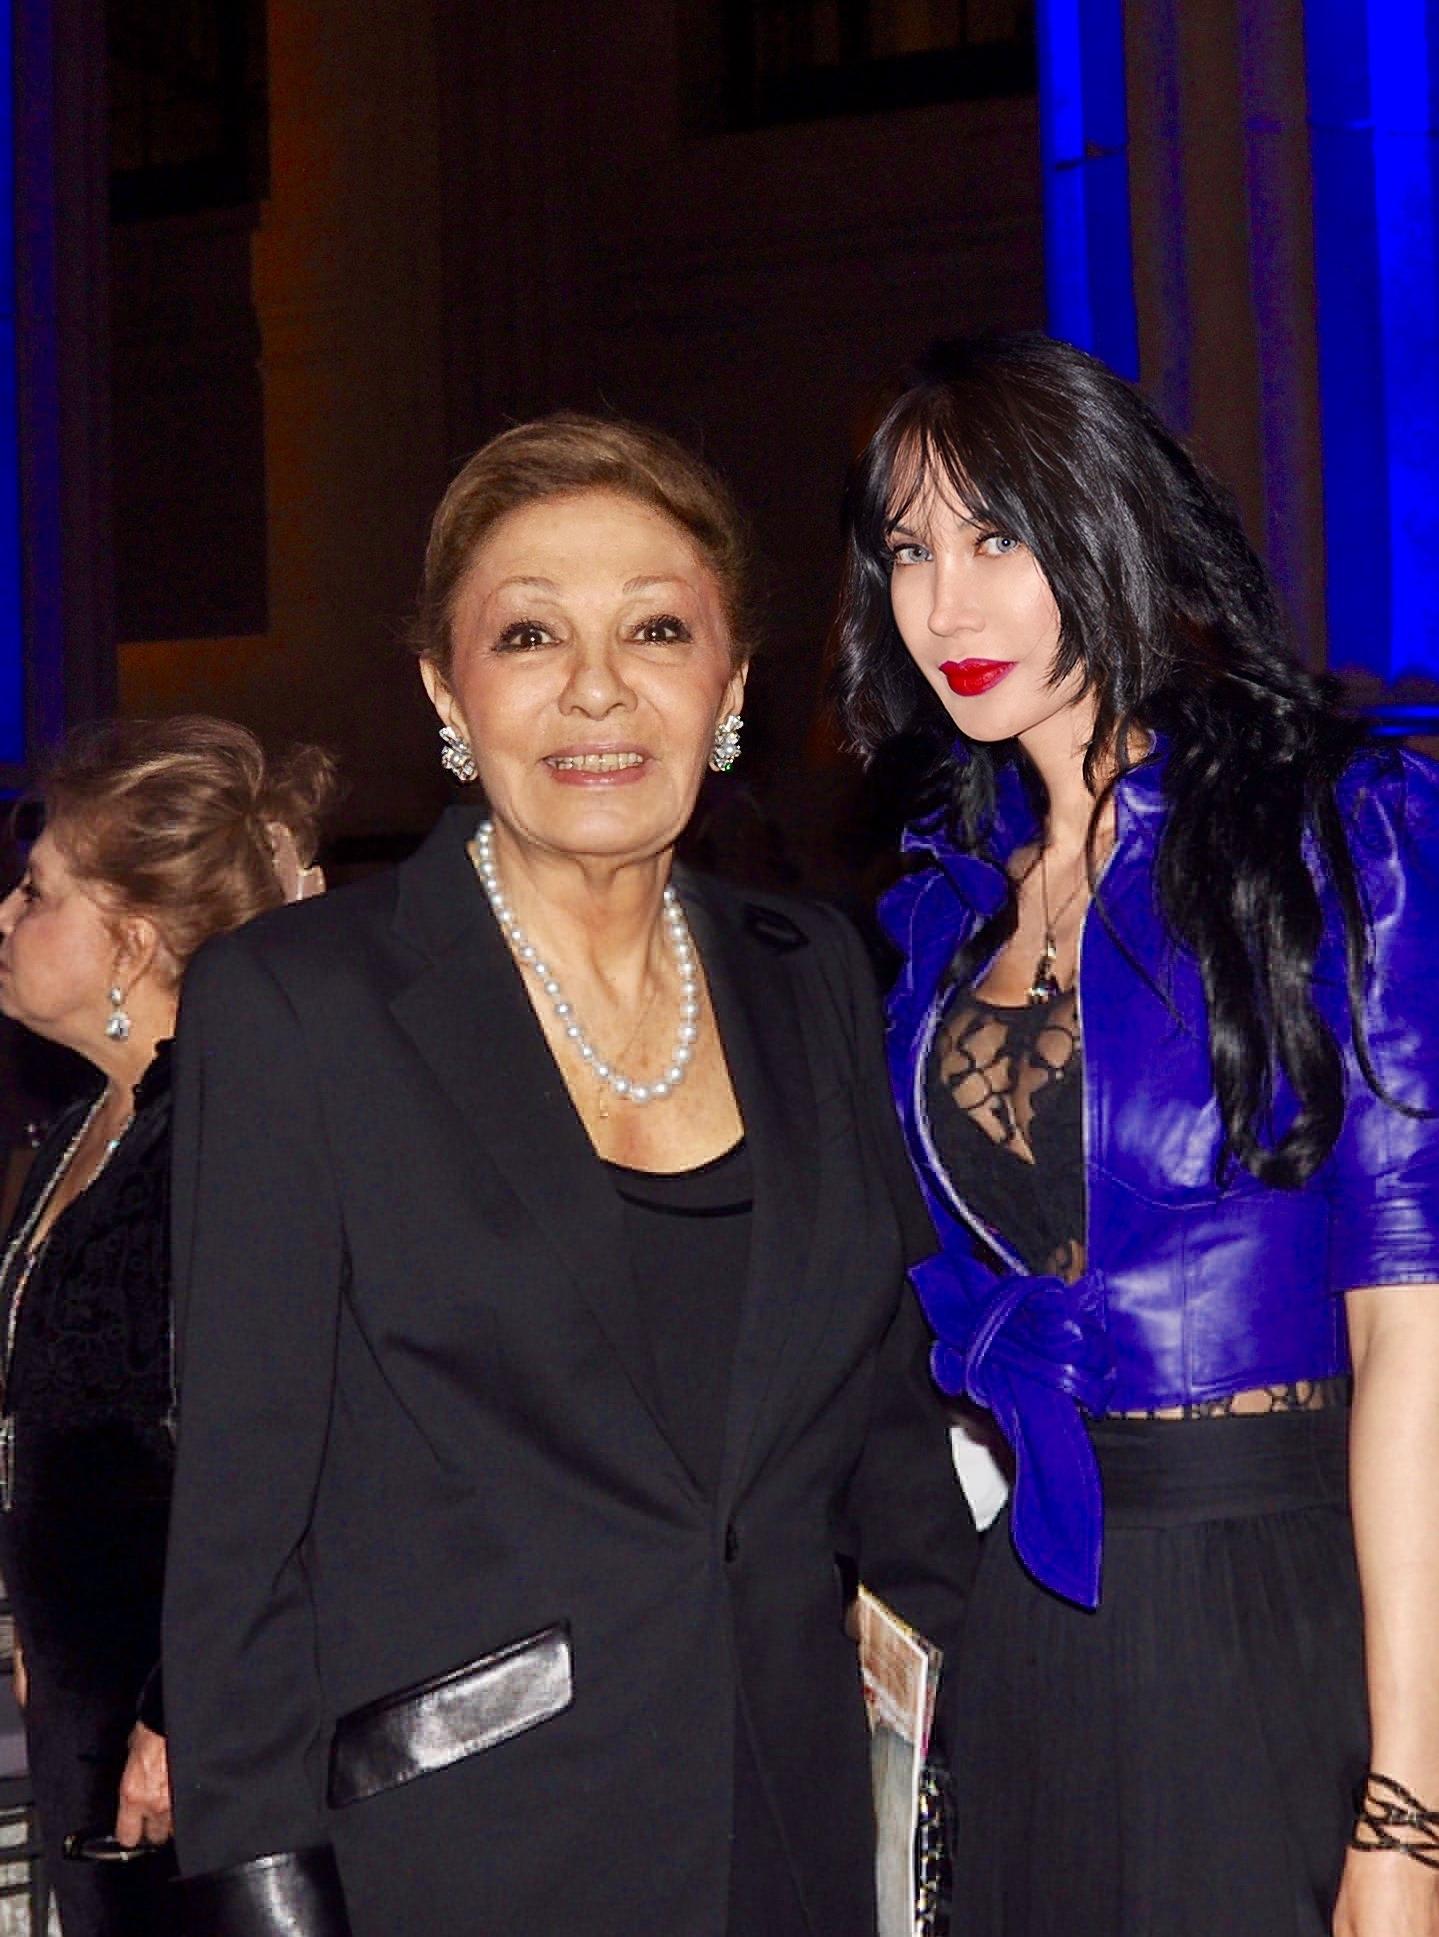 Queen Farah with Refugees International Board Member Demet Öger